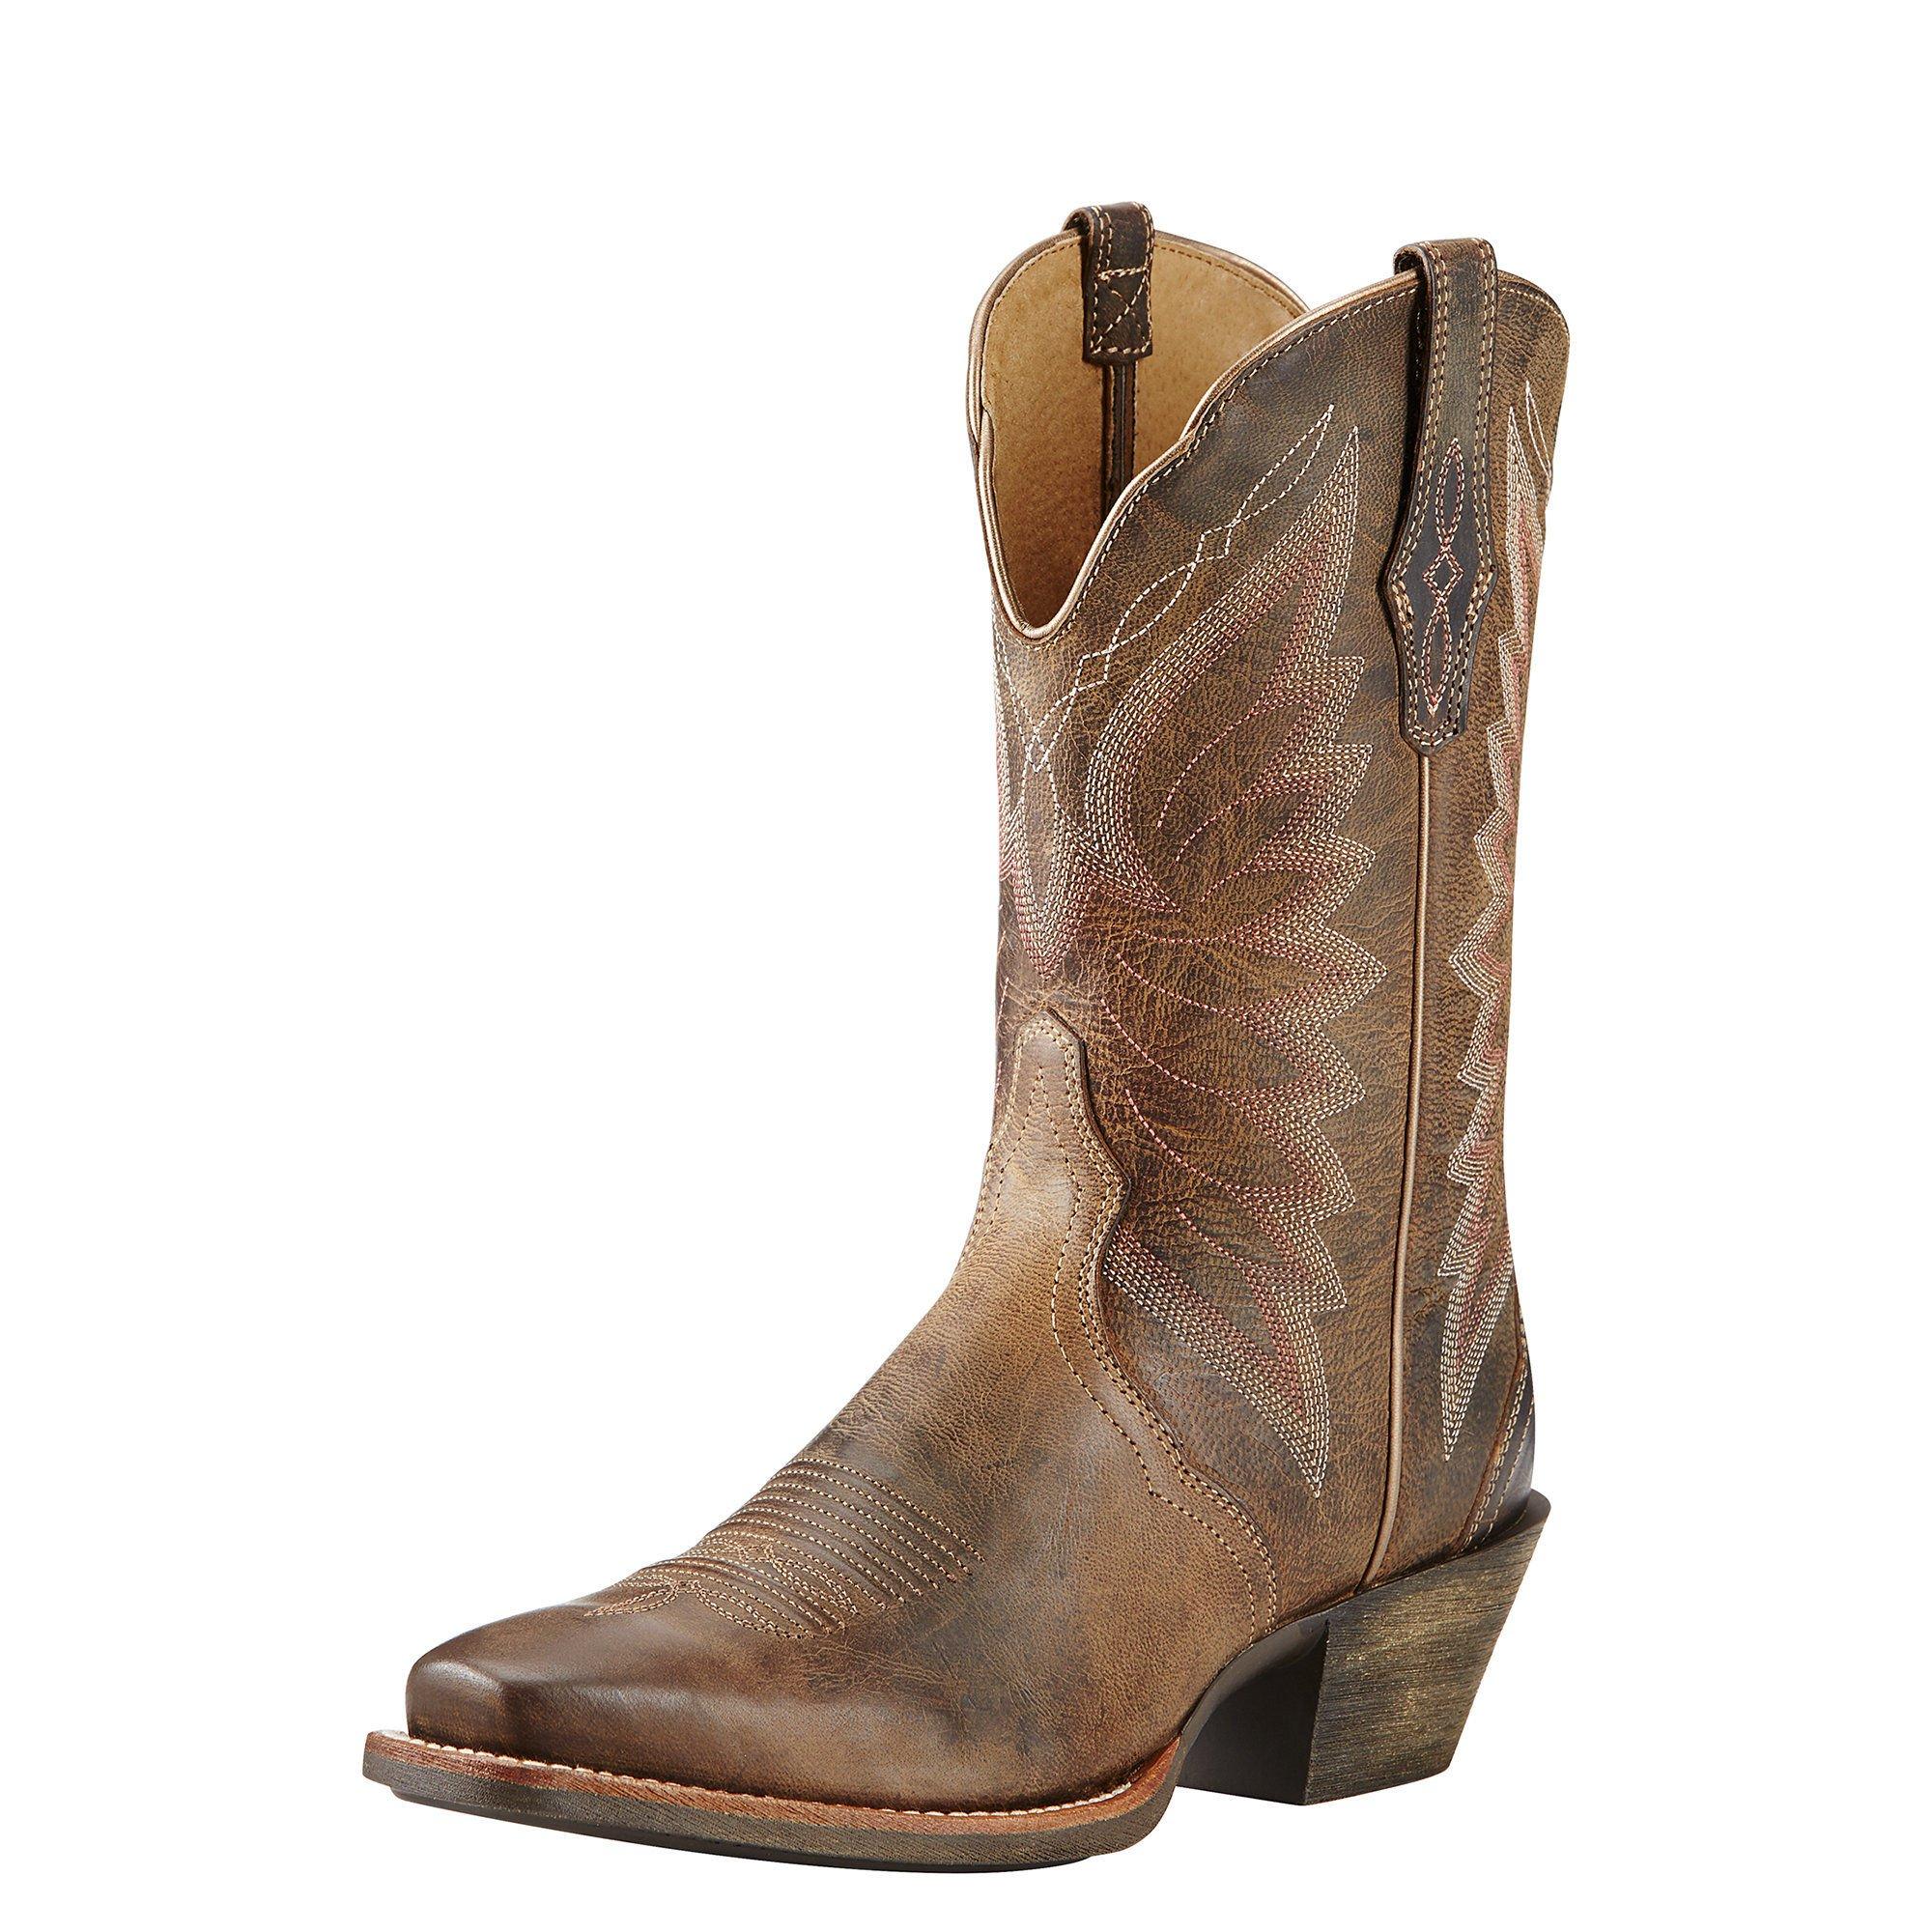 Ariat Women's Autry Western Cowboy Boot, Woodsmoke, 8 B US